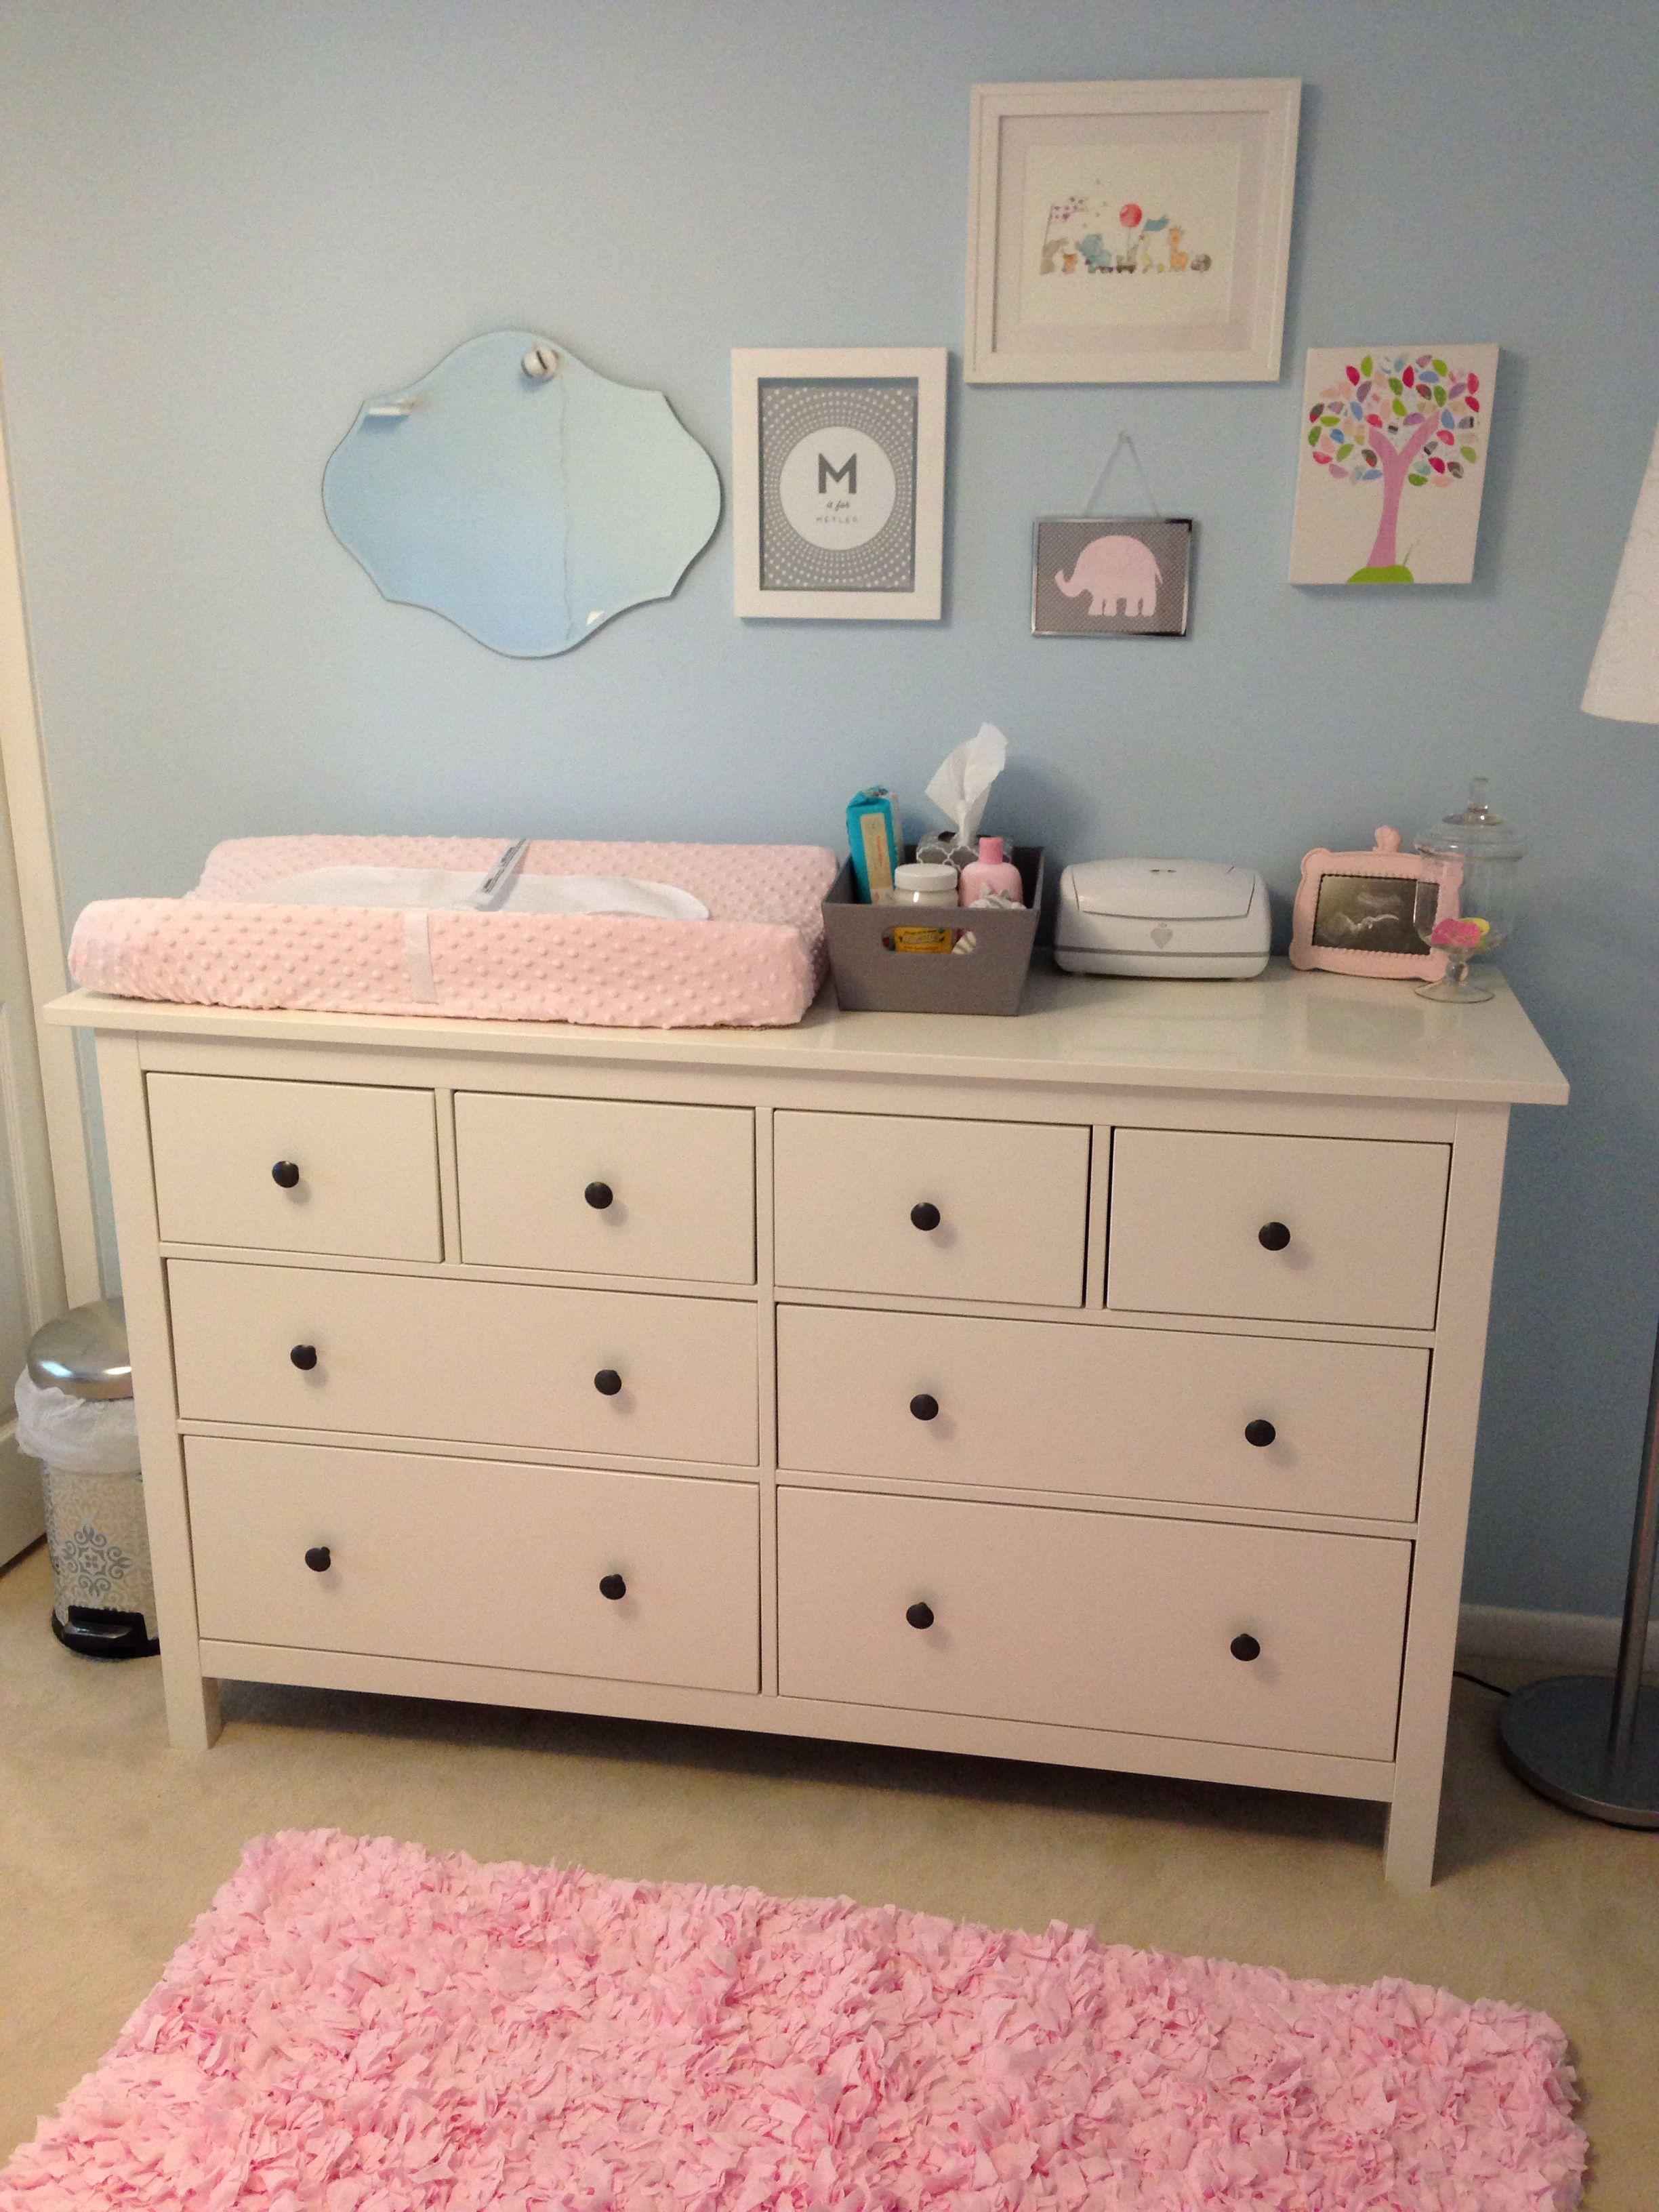 Light Blue Pink Nursery With Ikea Dresser As Changing Table Changing Table Dresser Baby Changing Tables Changing Table